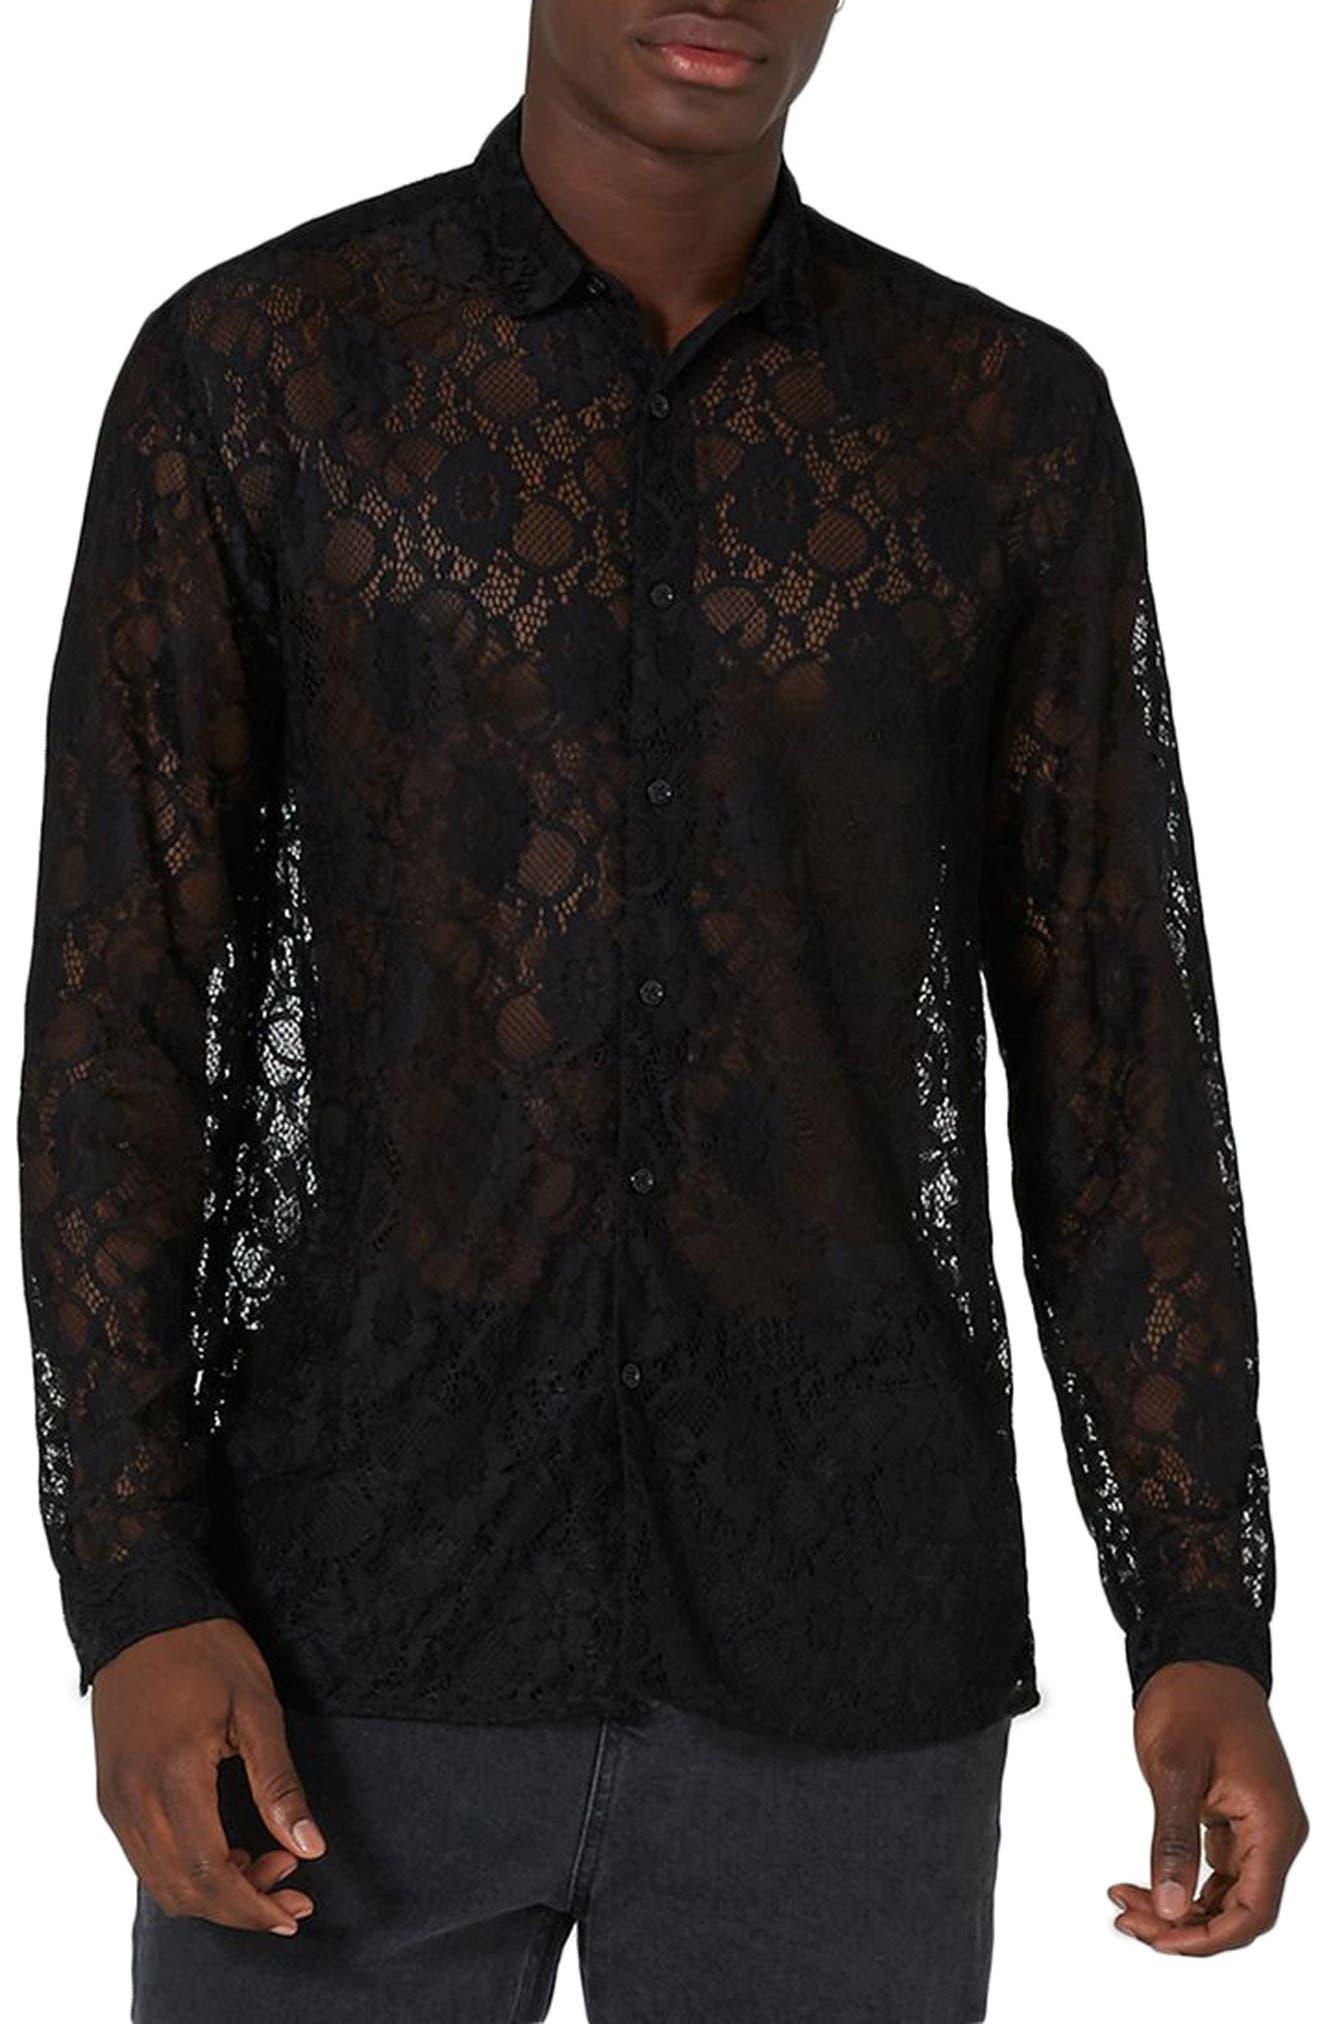 Muscle Fit Sheer Lace Shirt,                             Main thumbnail 1, color,                             001